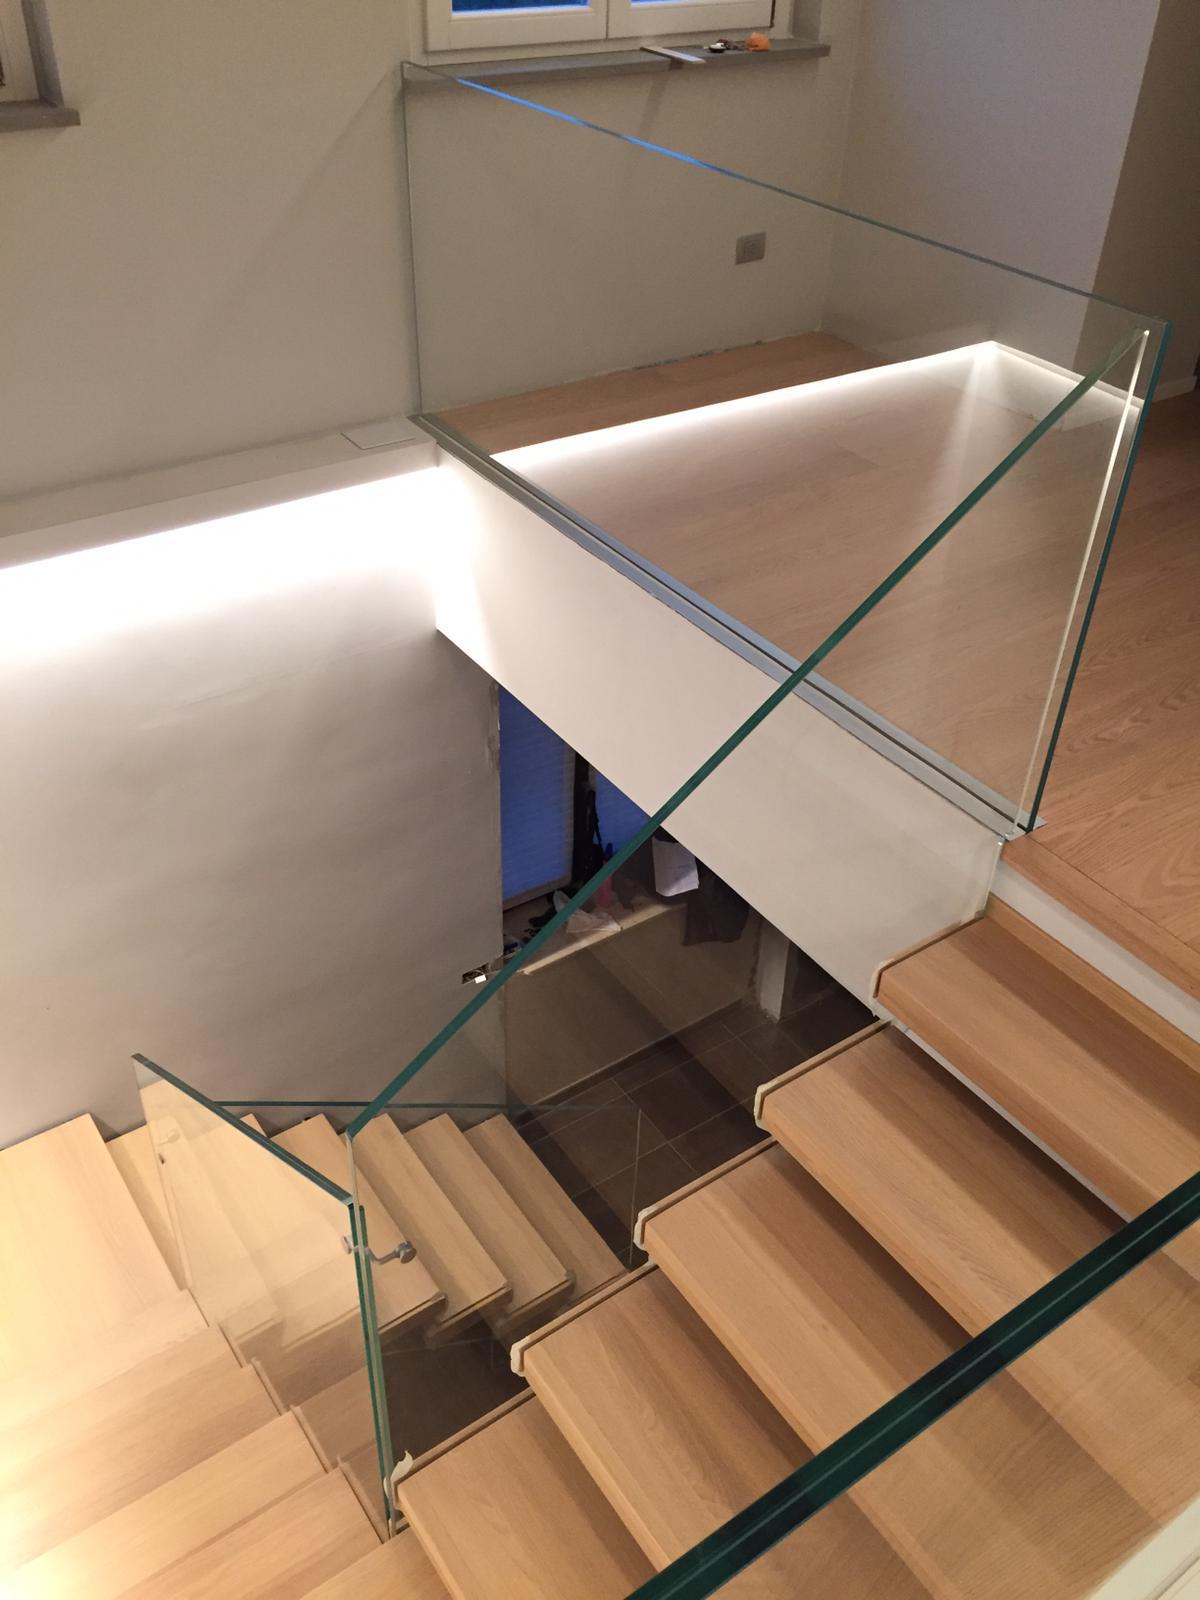 sbalzo legno vetro 11 part 1